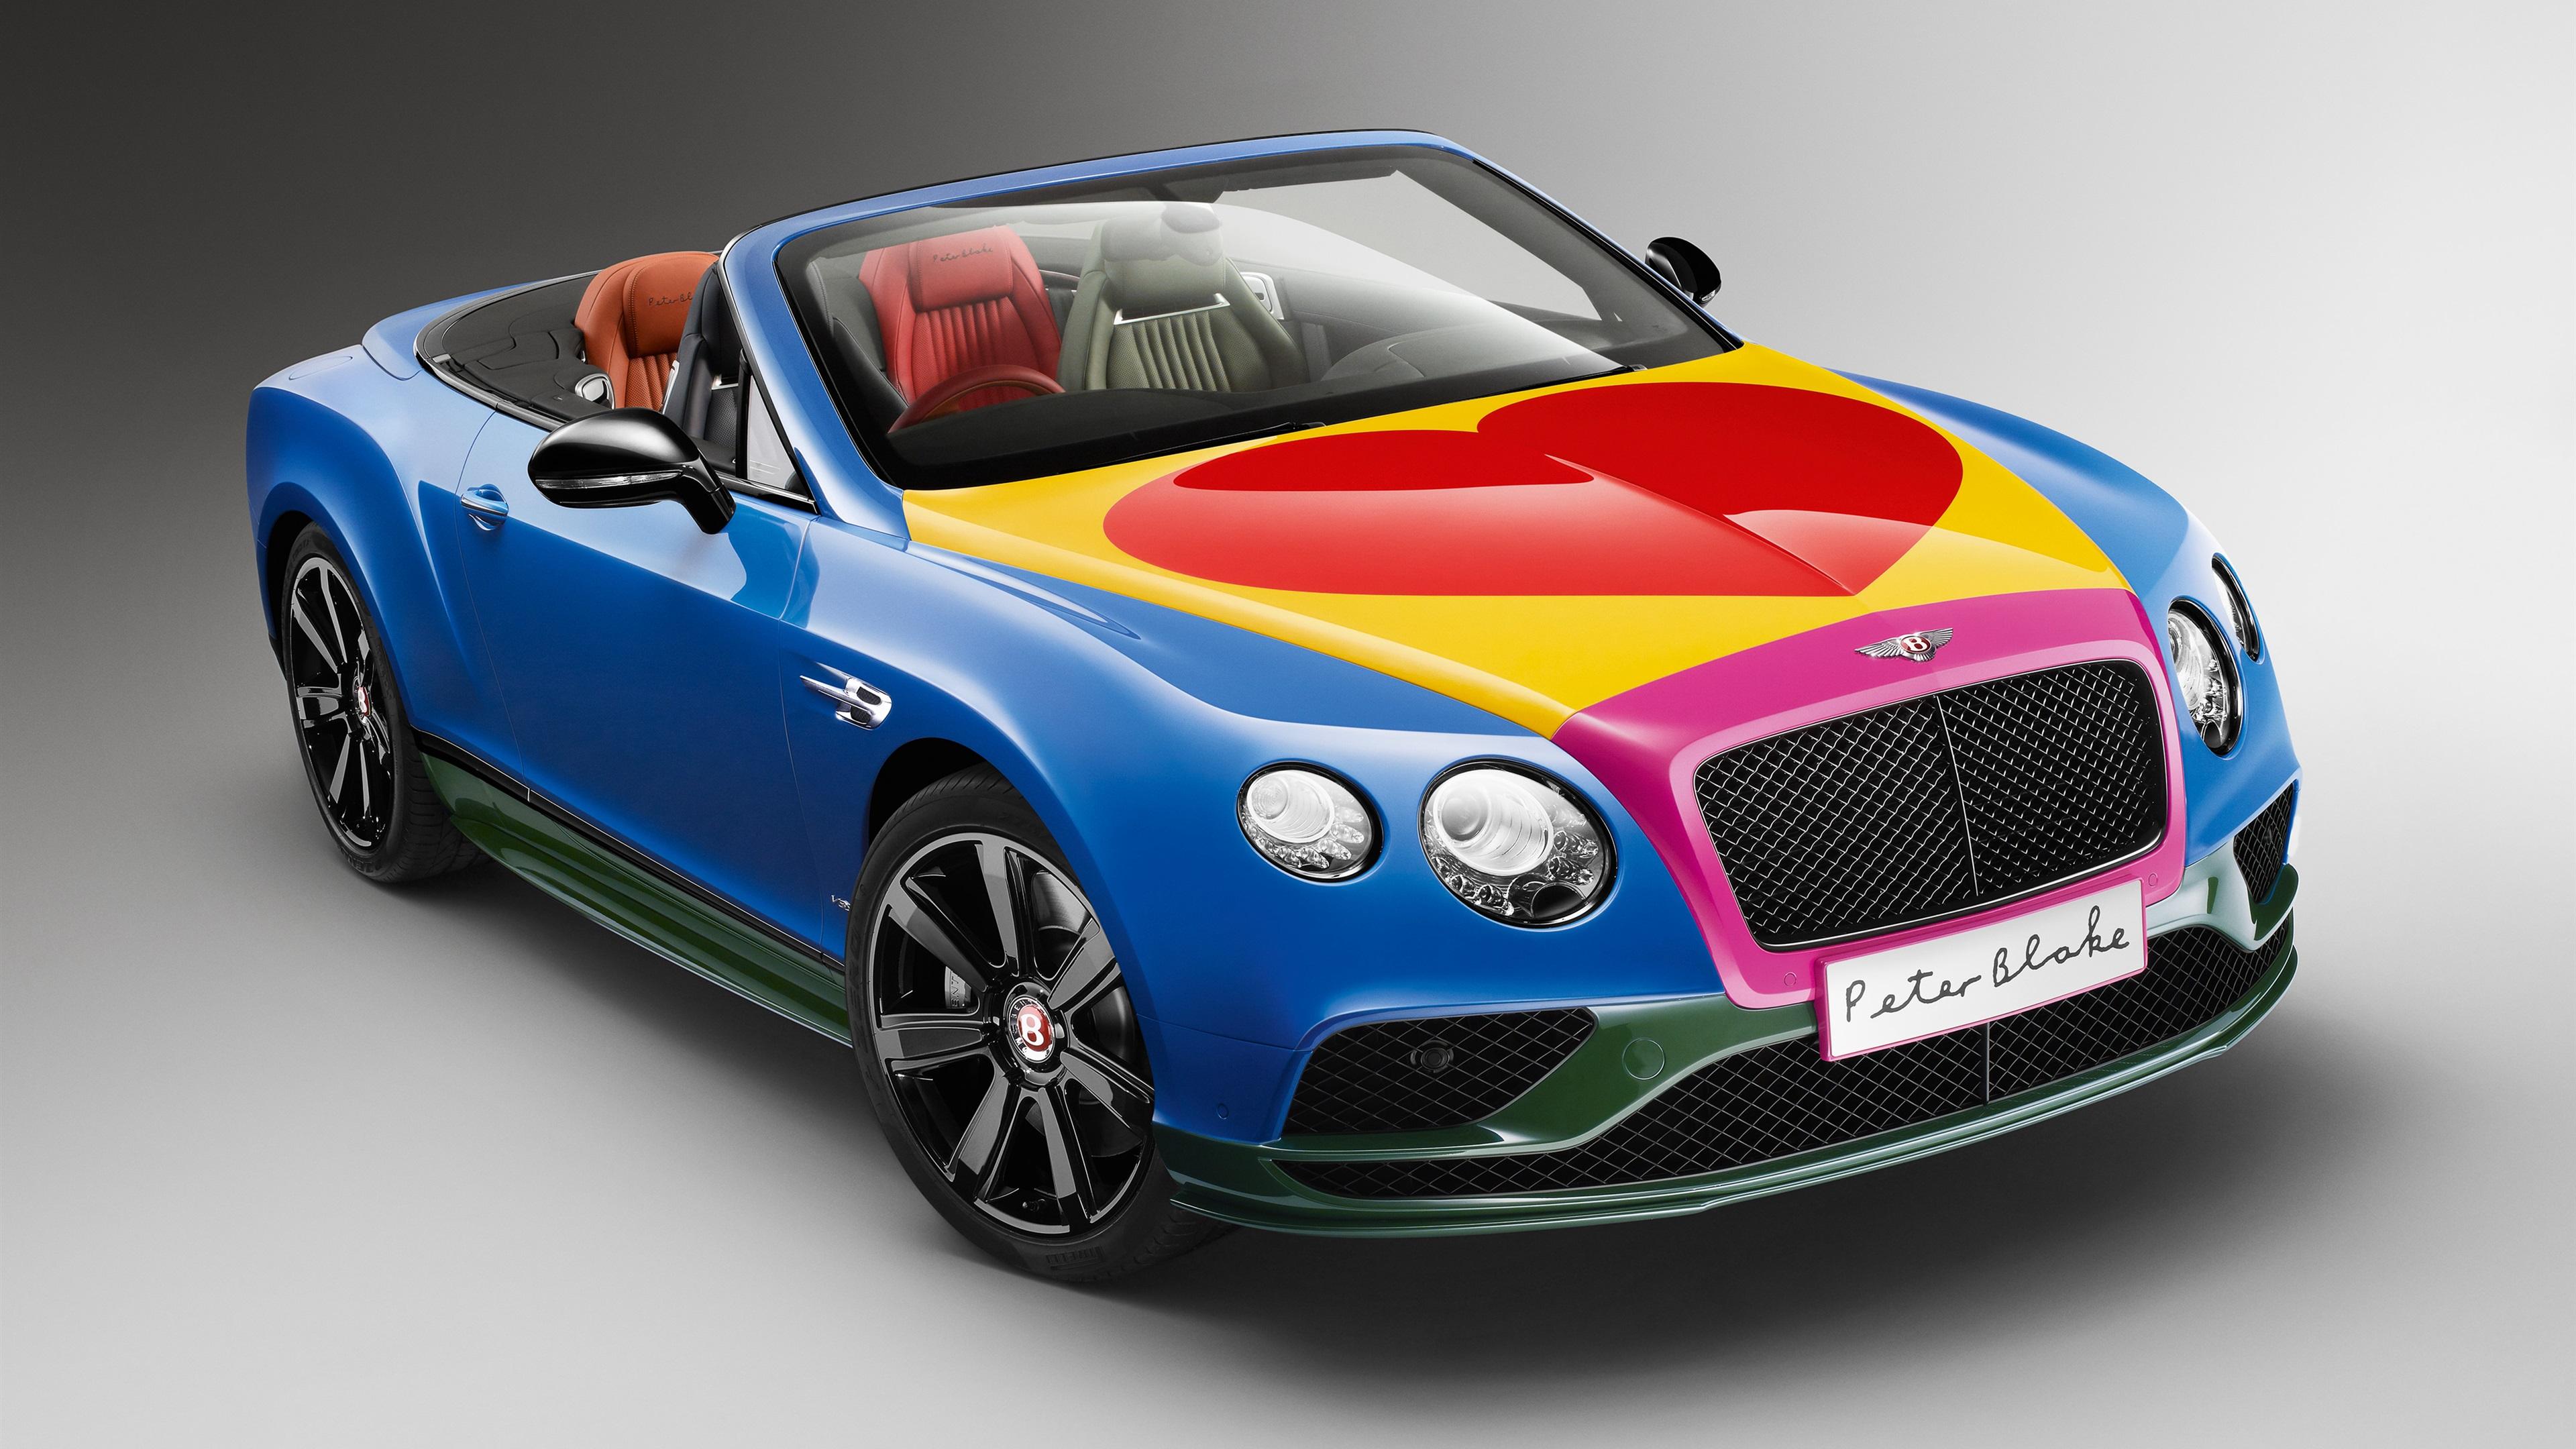 fonds d 39 cran bentley continental gt v8 de voiture d capotable de belles couleurs 3840x2160 uhd. Black Bedroom Furniture Sets. Home Design Ideas